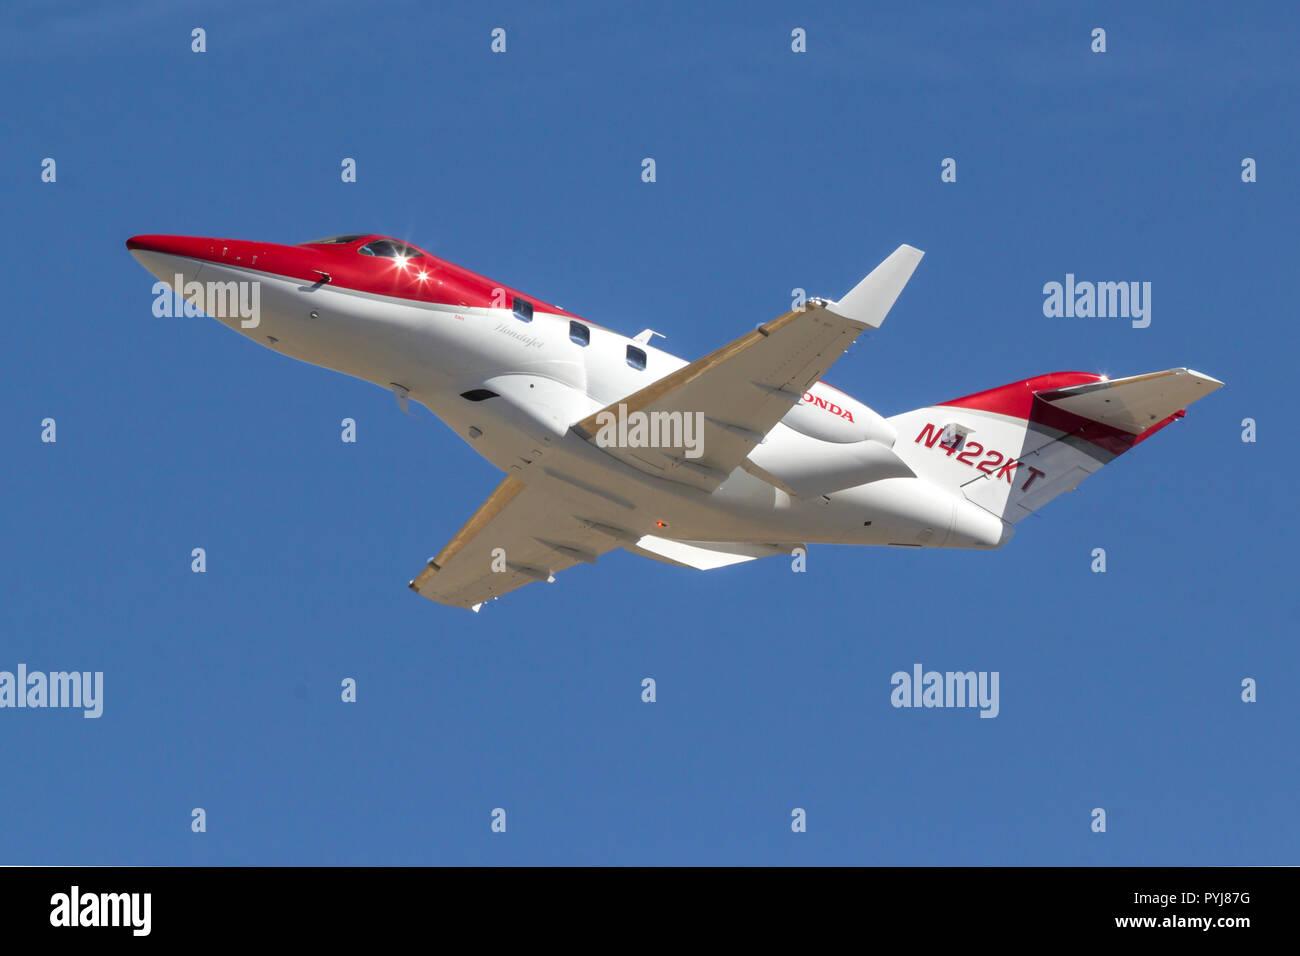 Honda HA-420 HondaJet in flight - Stock Image